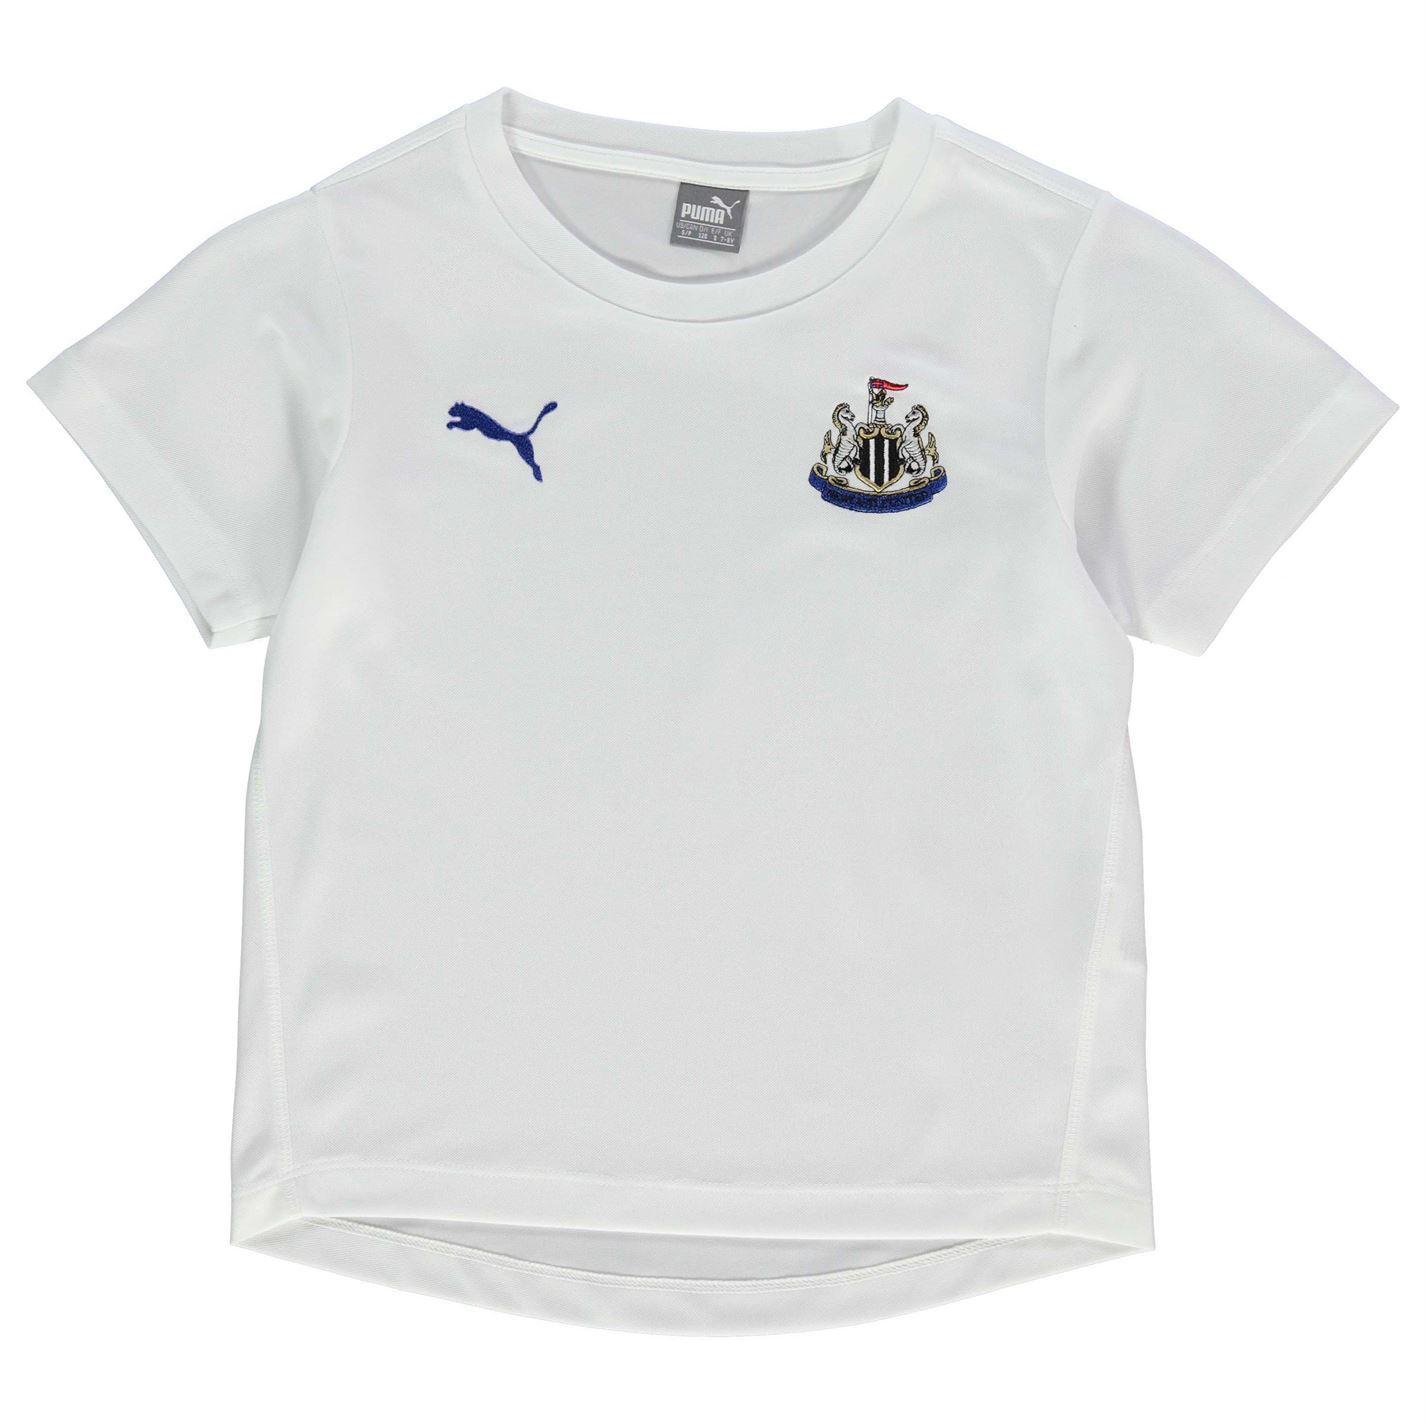 Puma Boys Newcastle United Performance T Shirt Top Childrens Casual